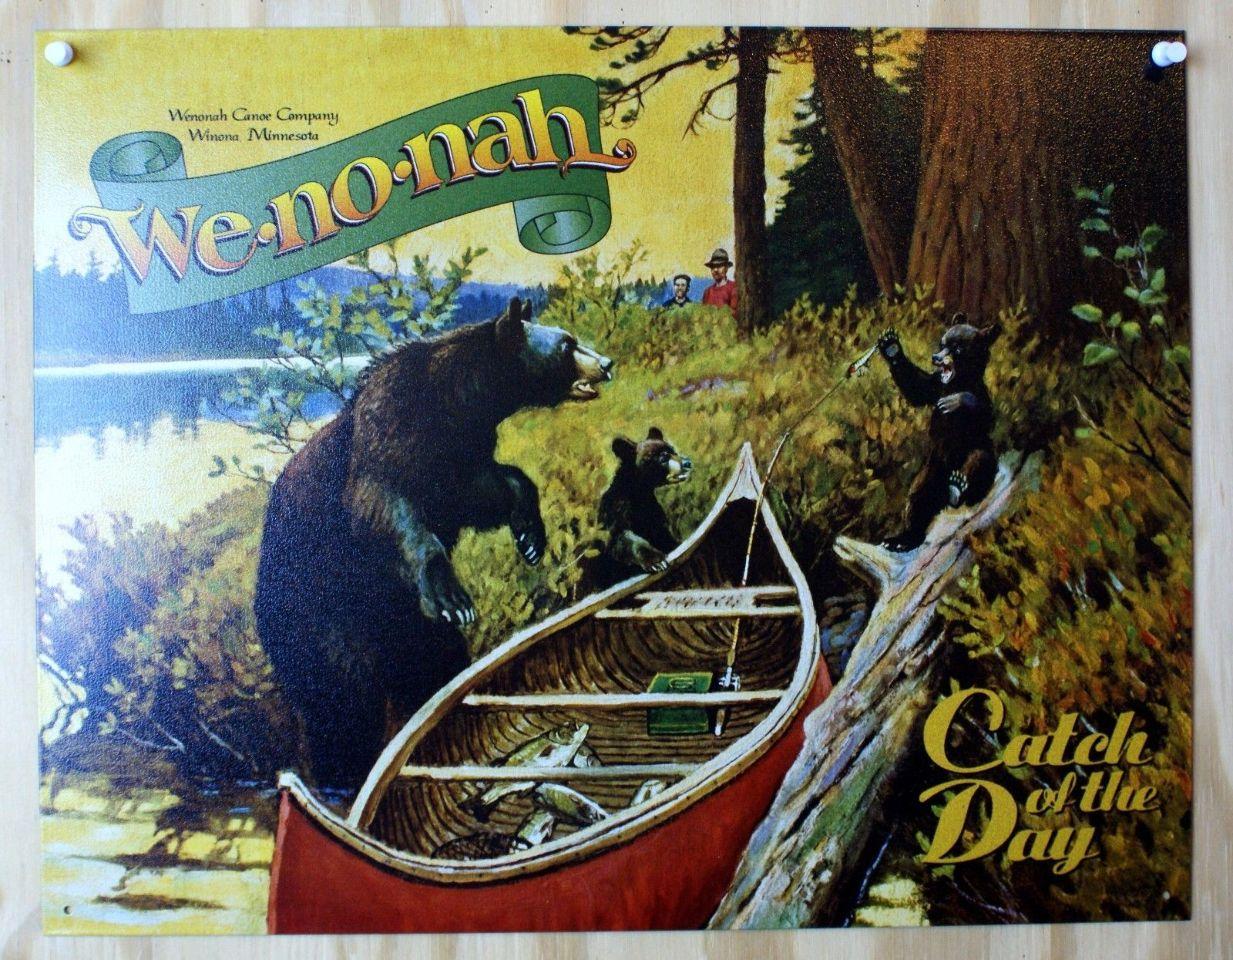 We-No-Nah Canoes Tin Metal Sign Outdoors Bears Bear Cub Fishing Cabin